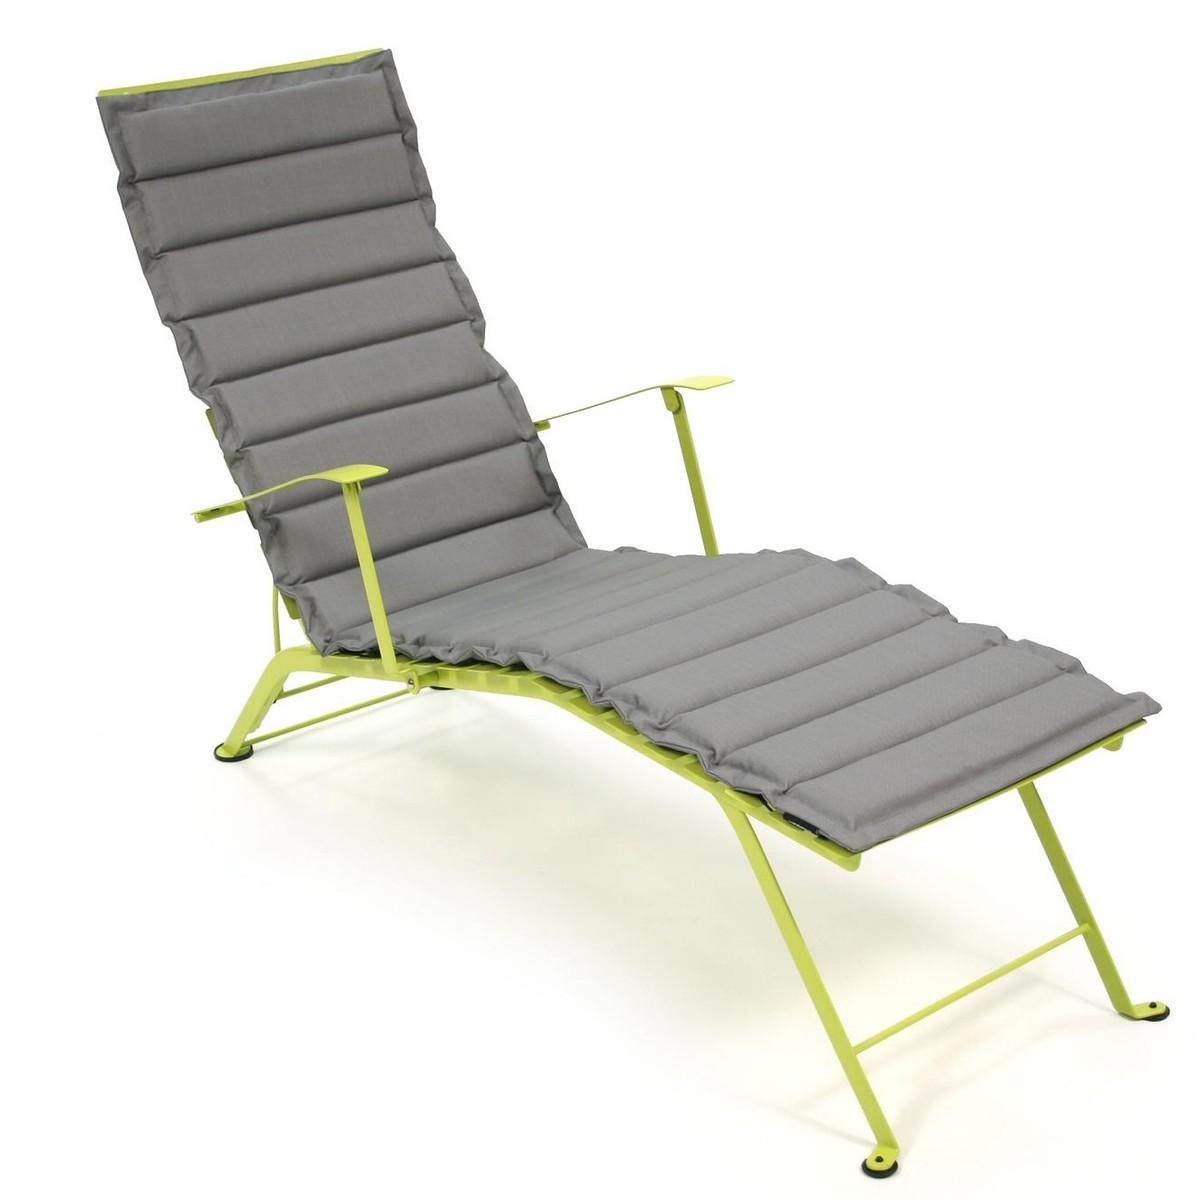 Bistro sun lounger cushion fermob for Matelas chaise longue jardin